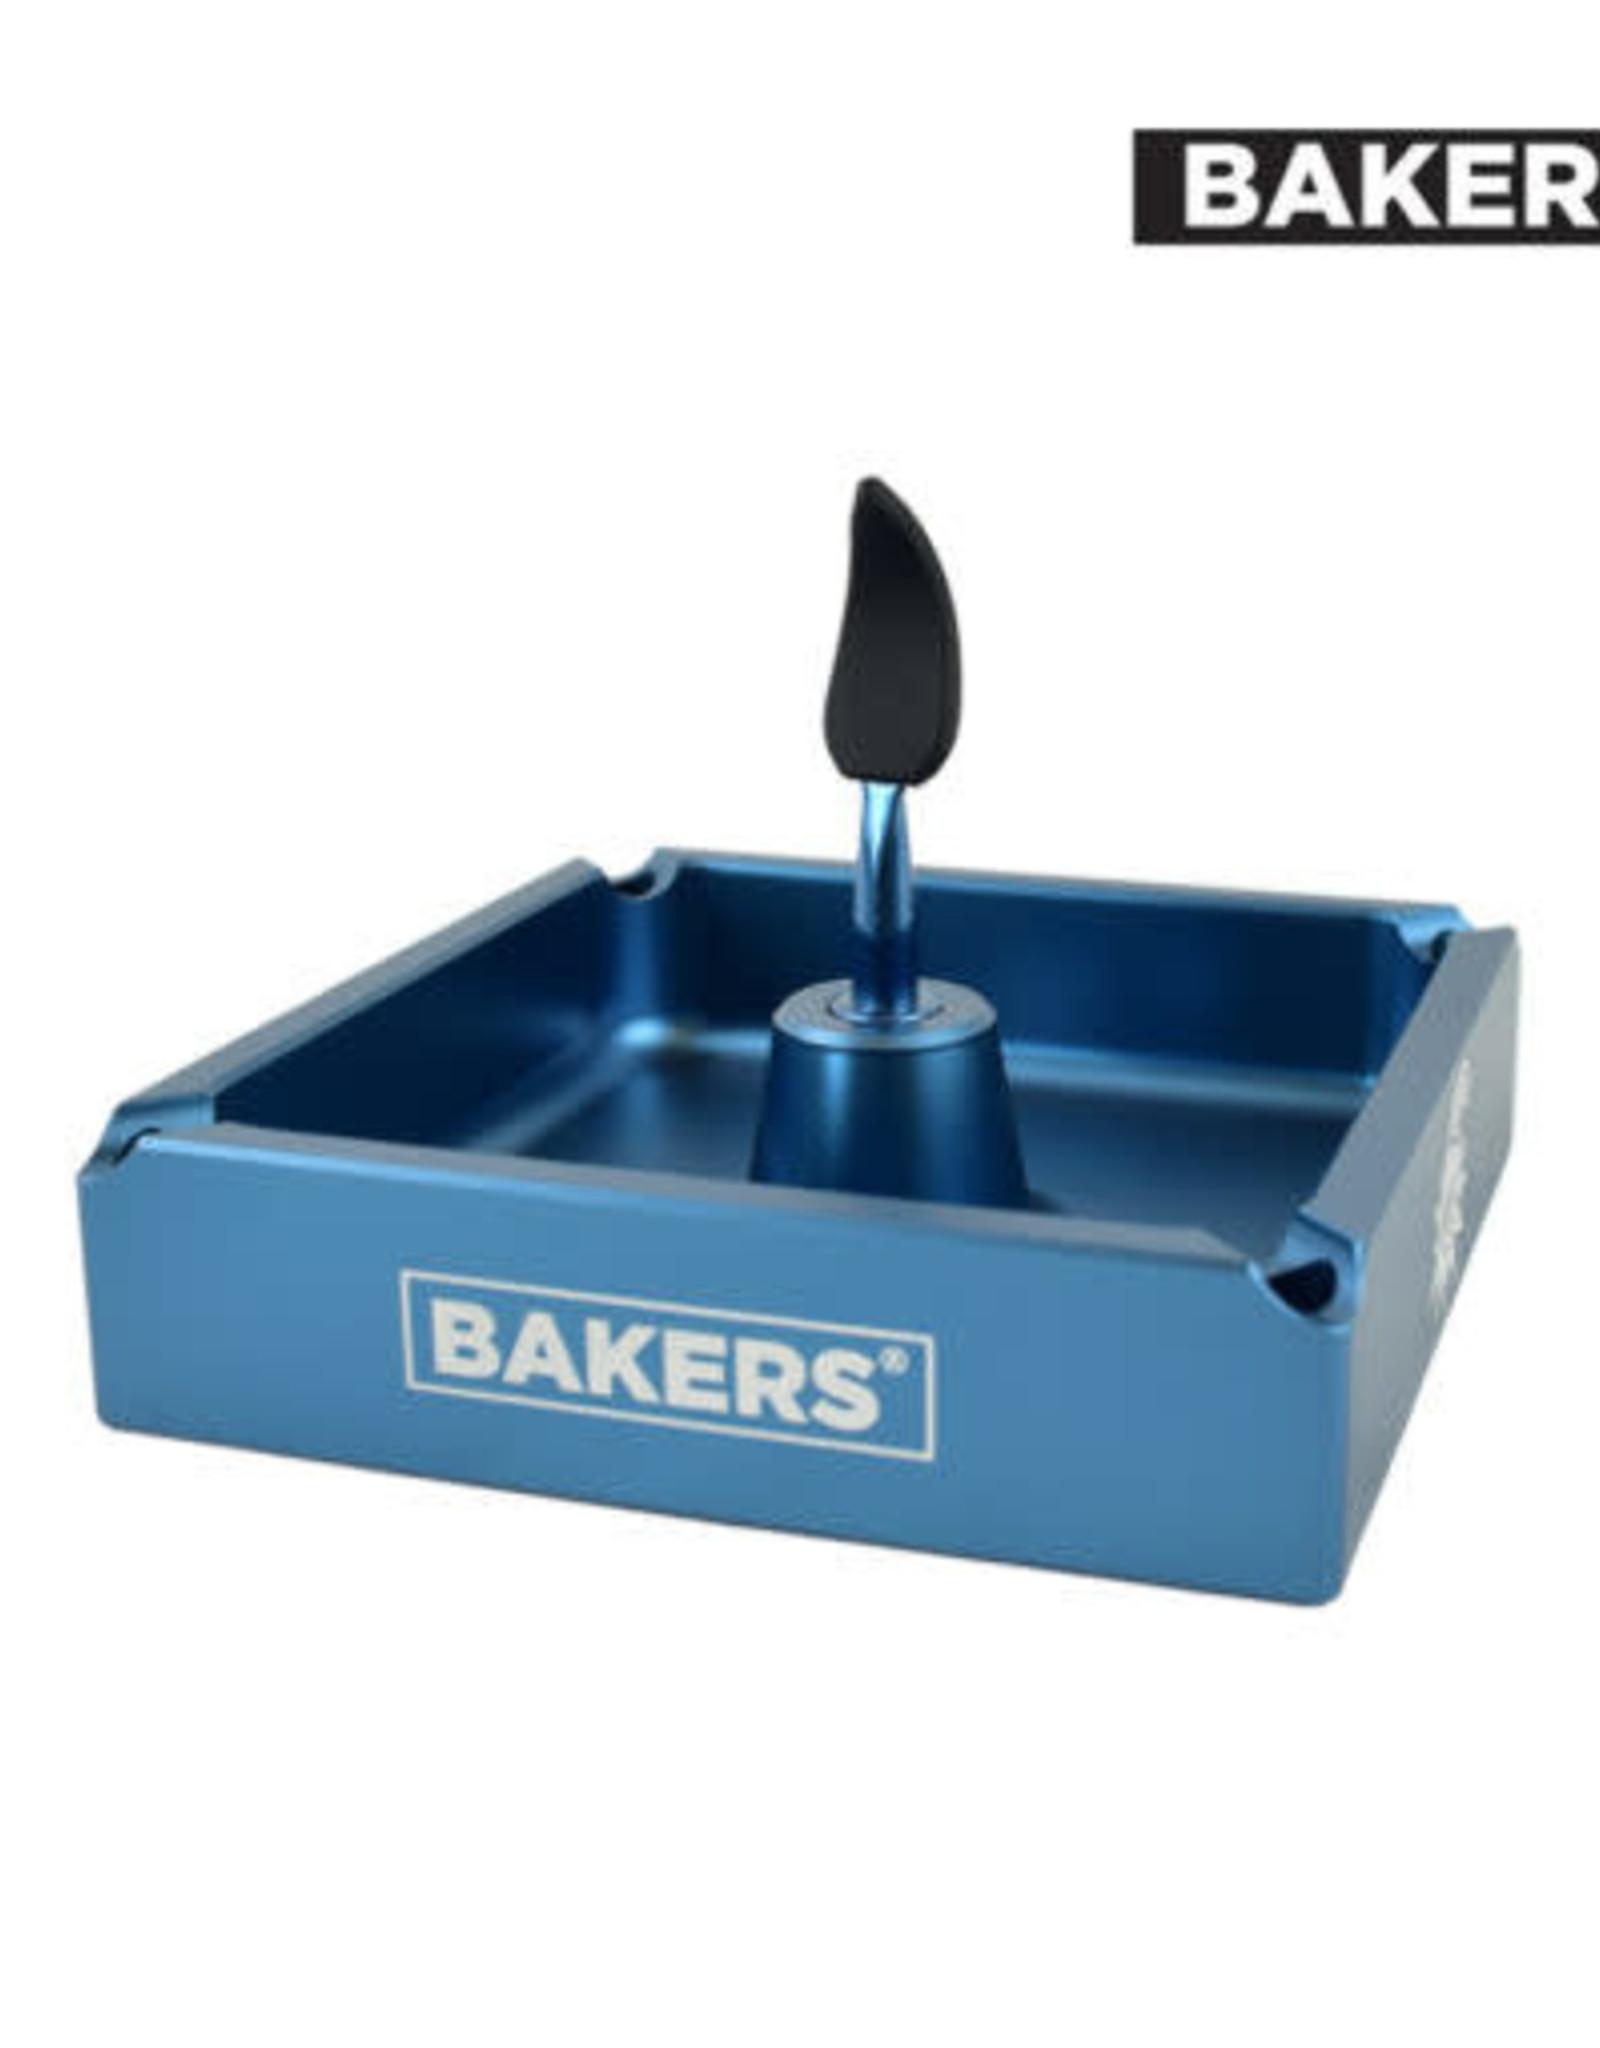 Bakers BAKERS BASHTRAY – BLUE